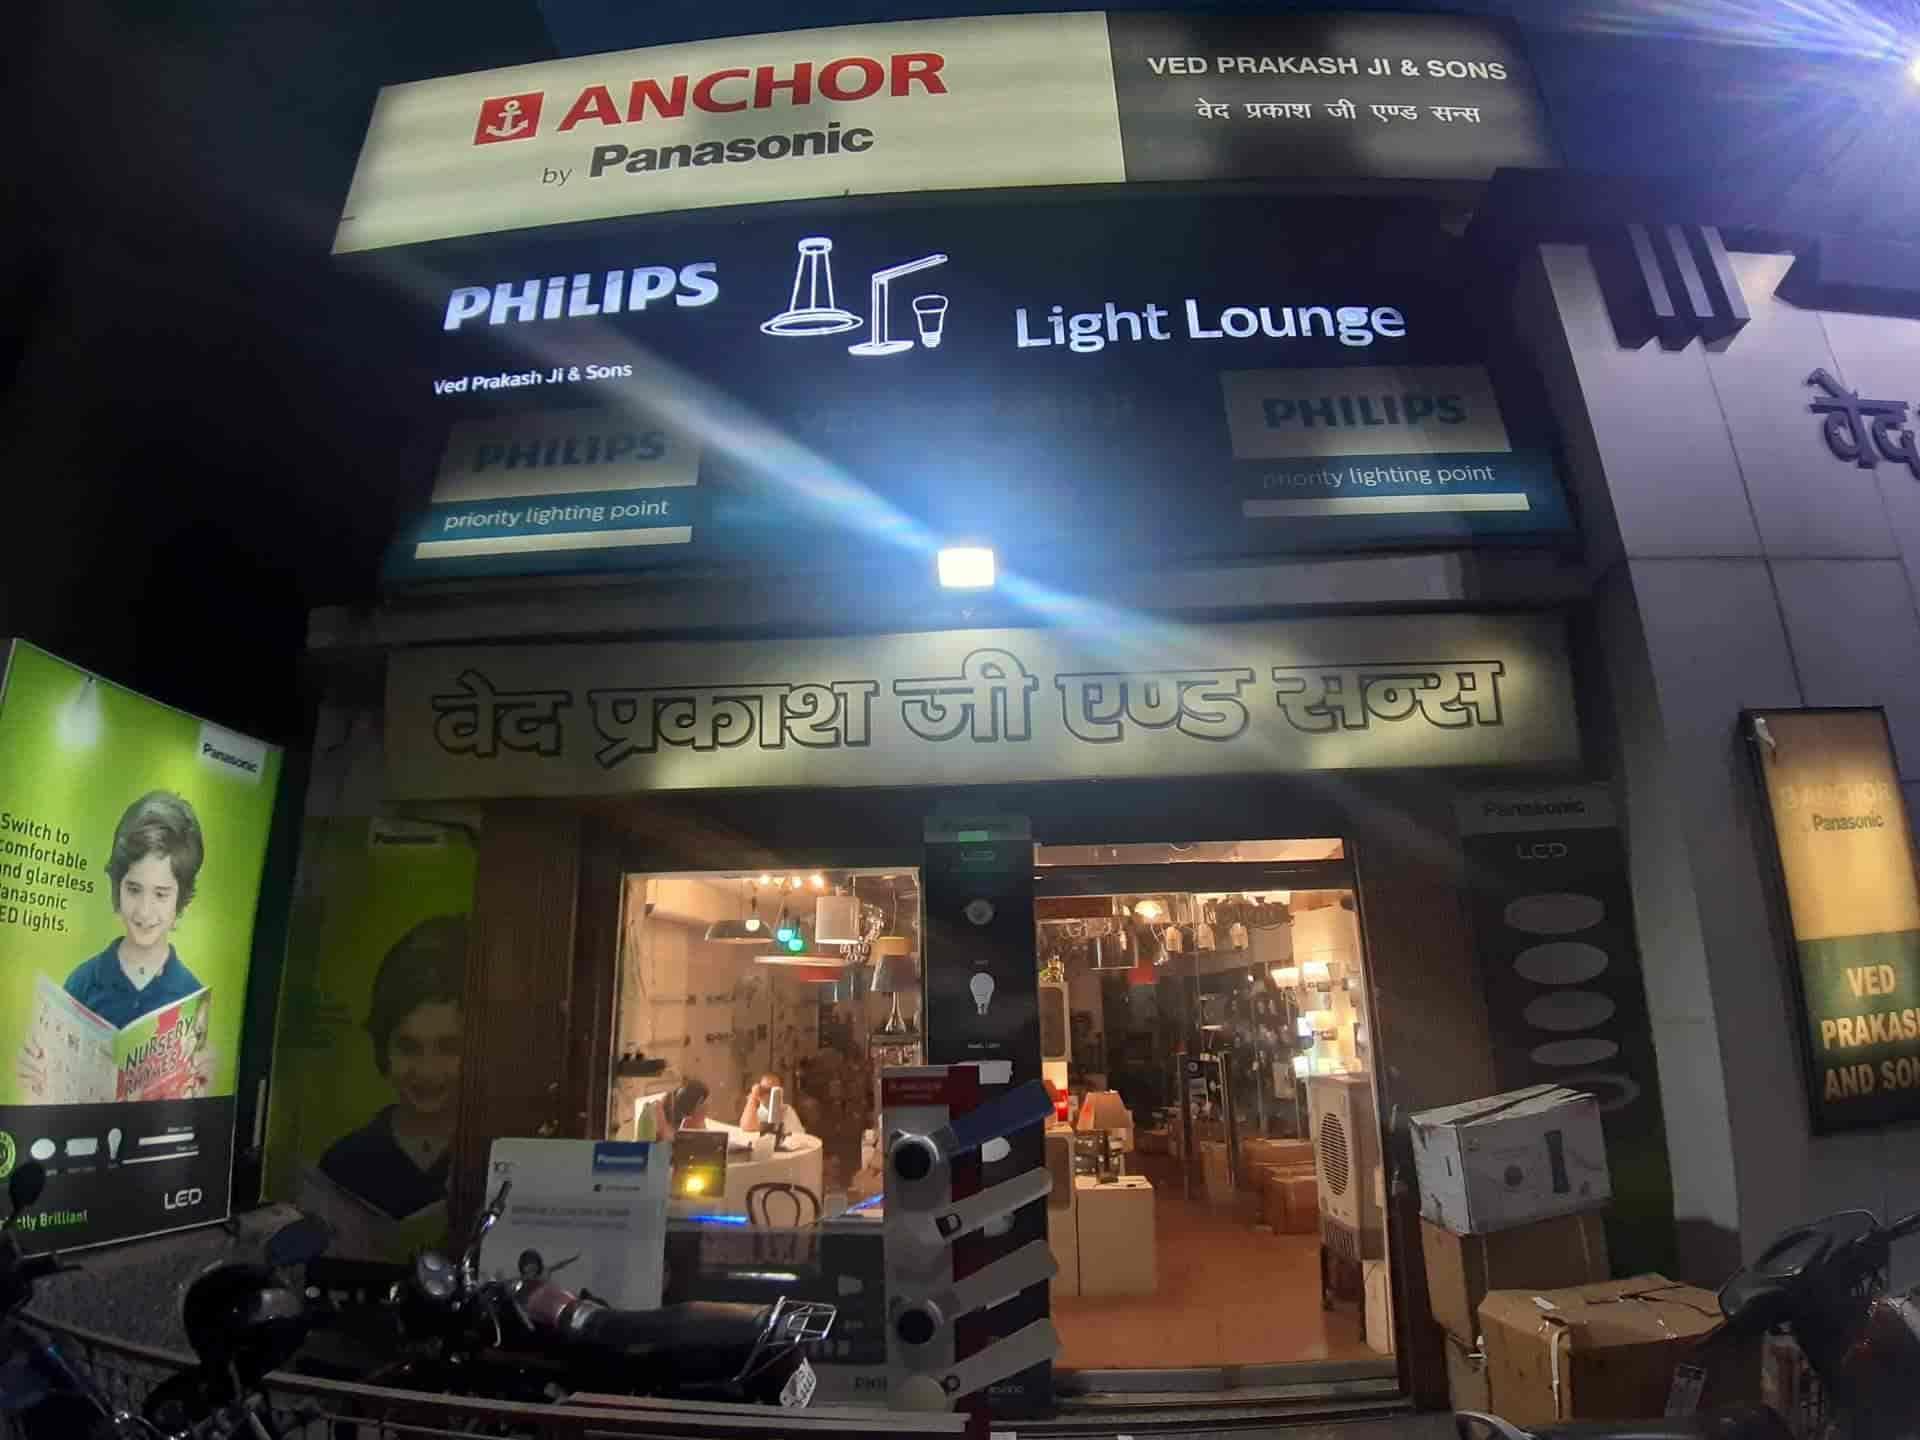 Ved Prakash ji & Sons, Delhi Road Meerut - Electricians in